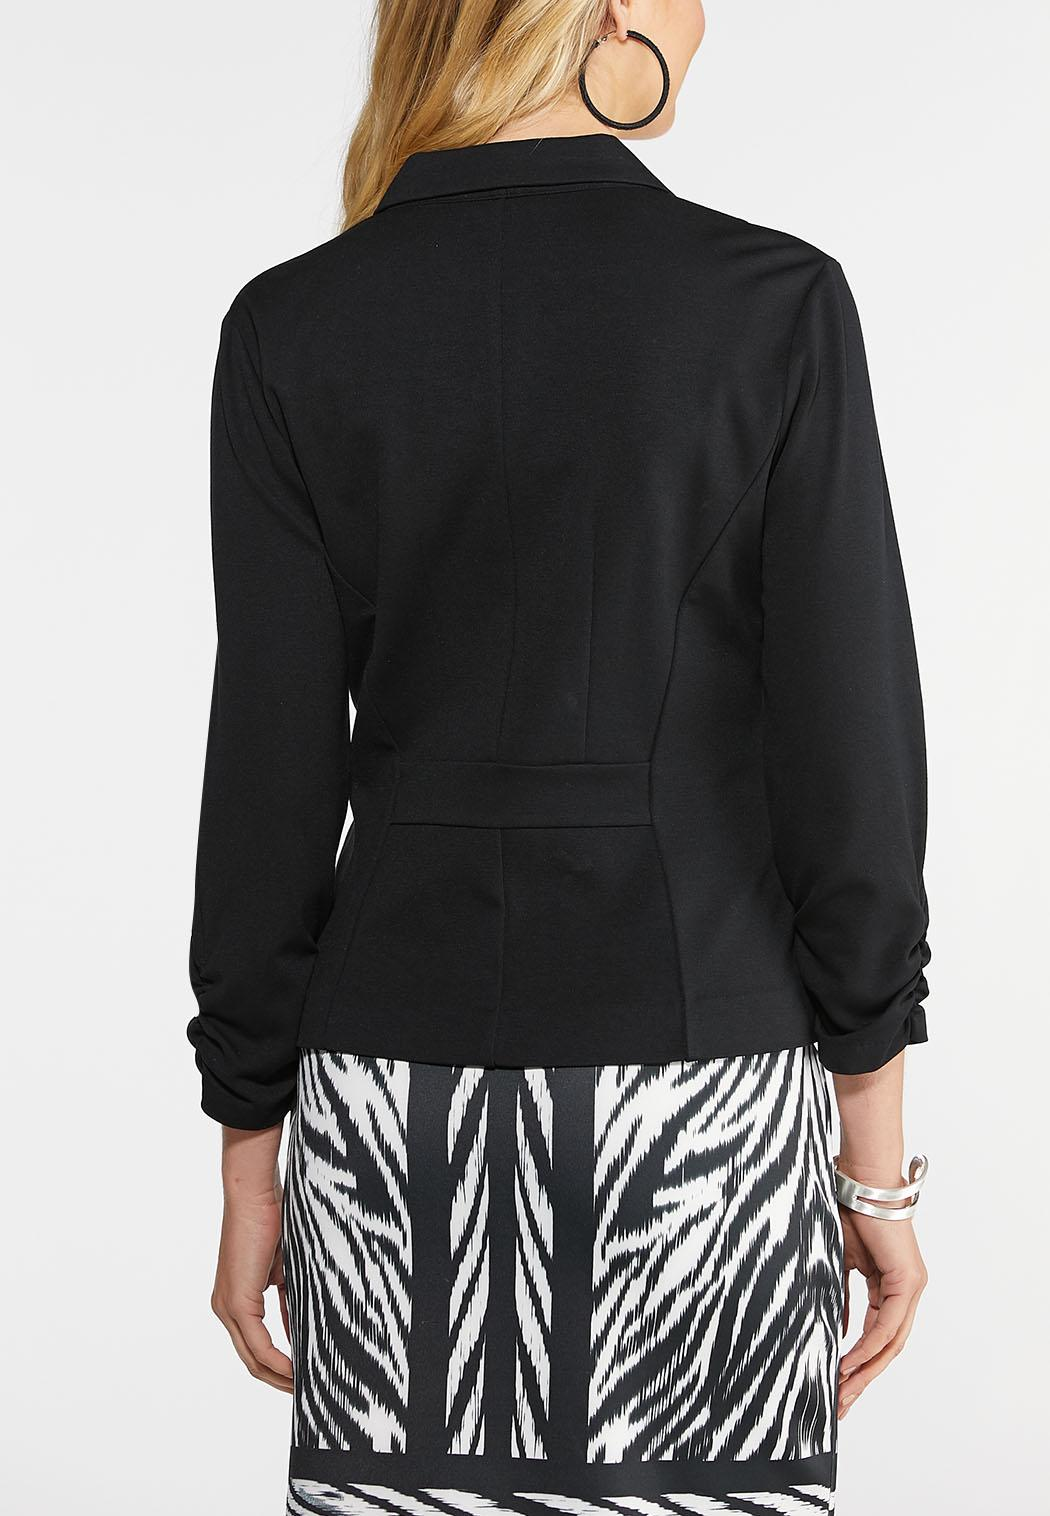 Plus Size Ruched Sleeve Ponte Blazer (Item #43954015)